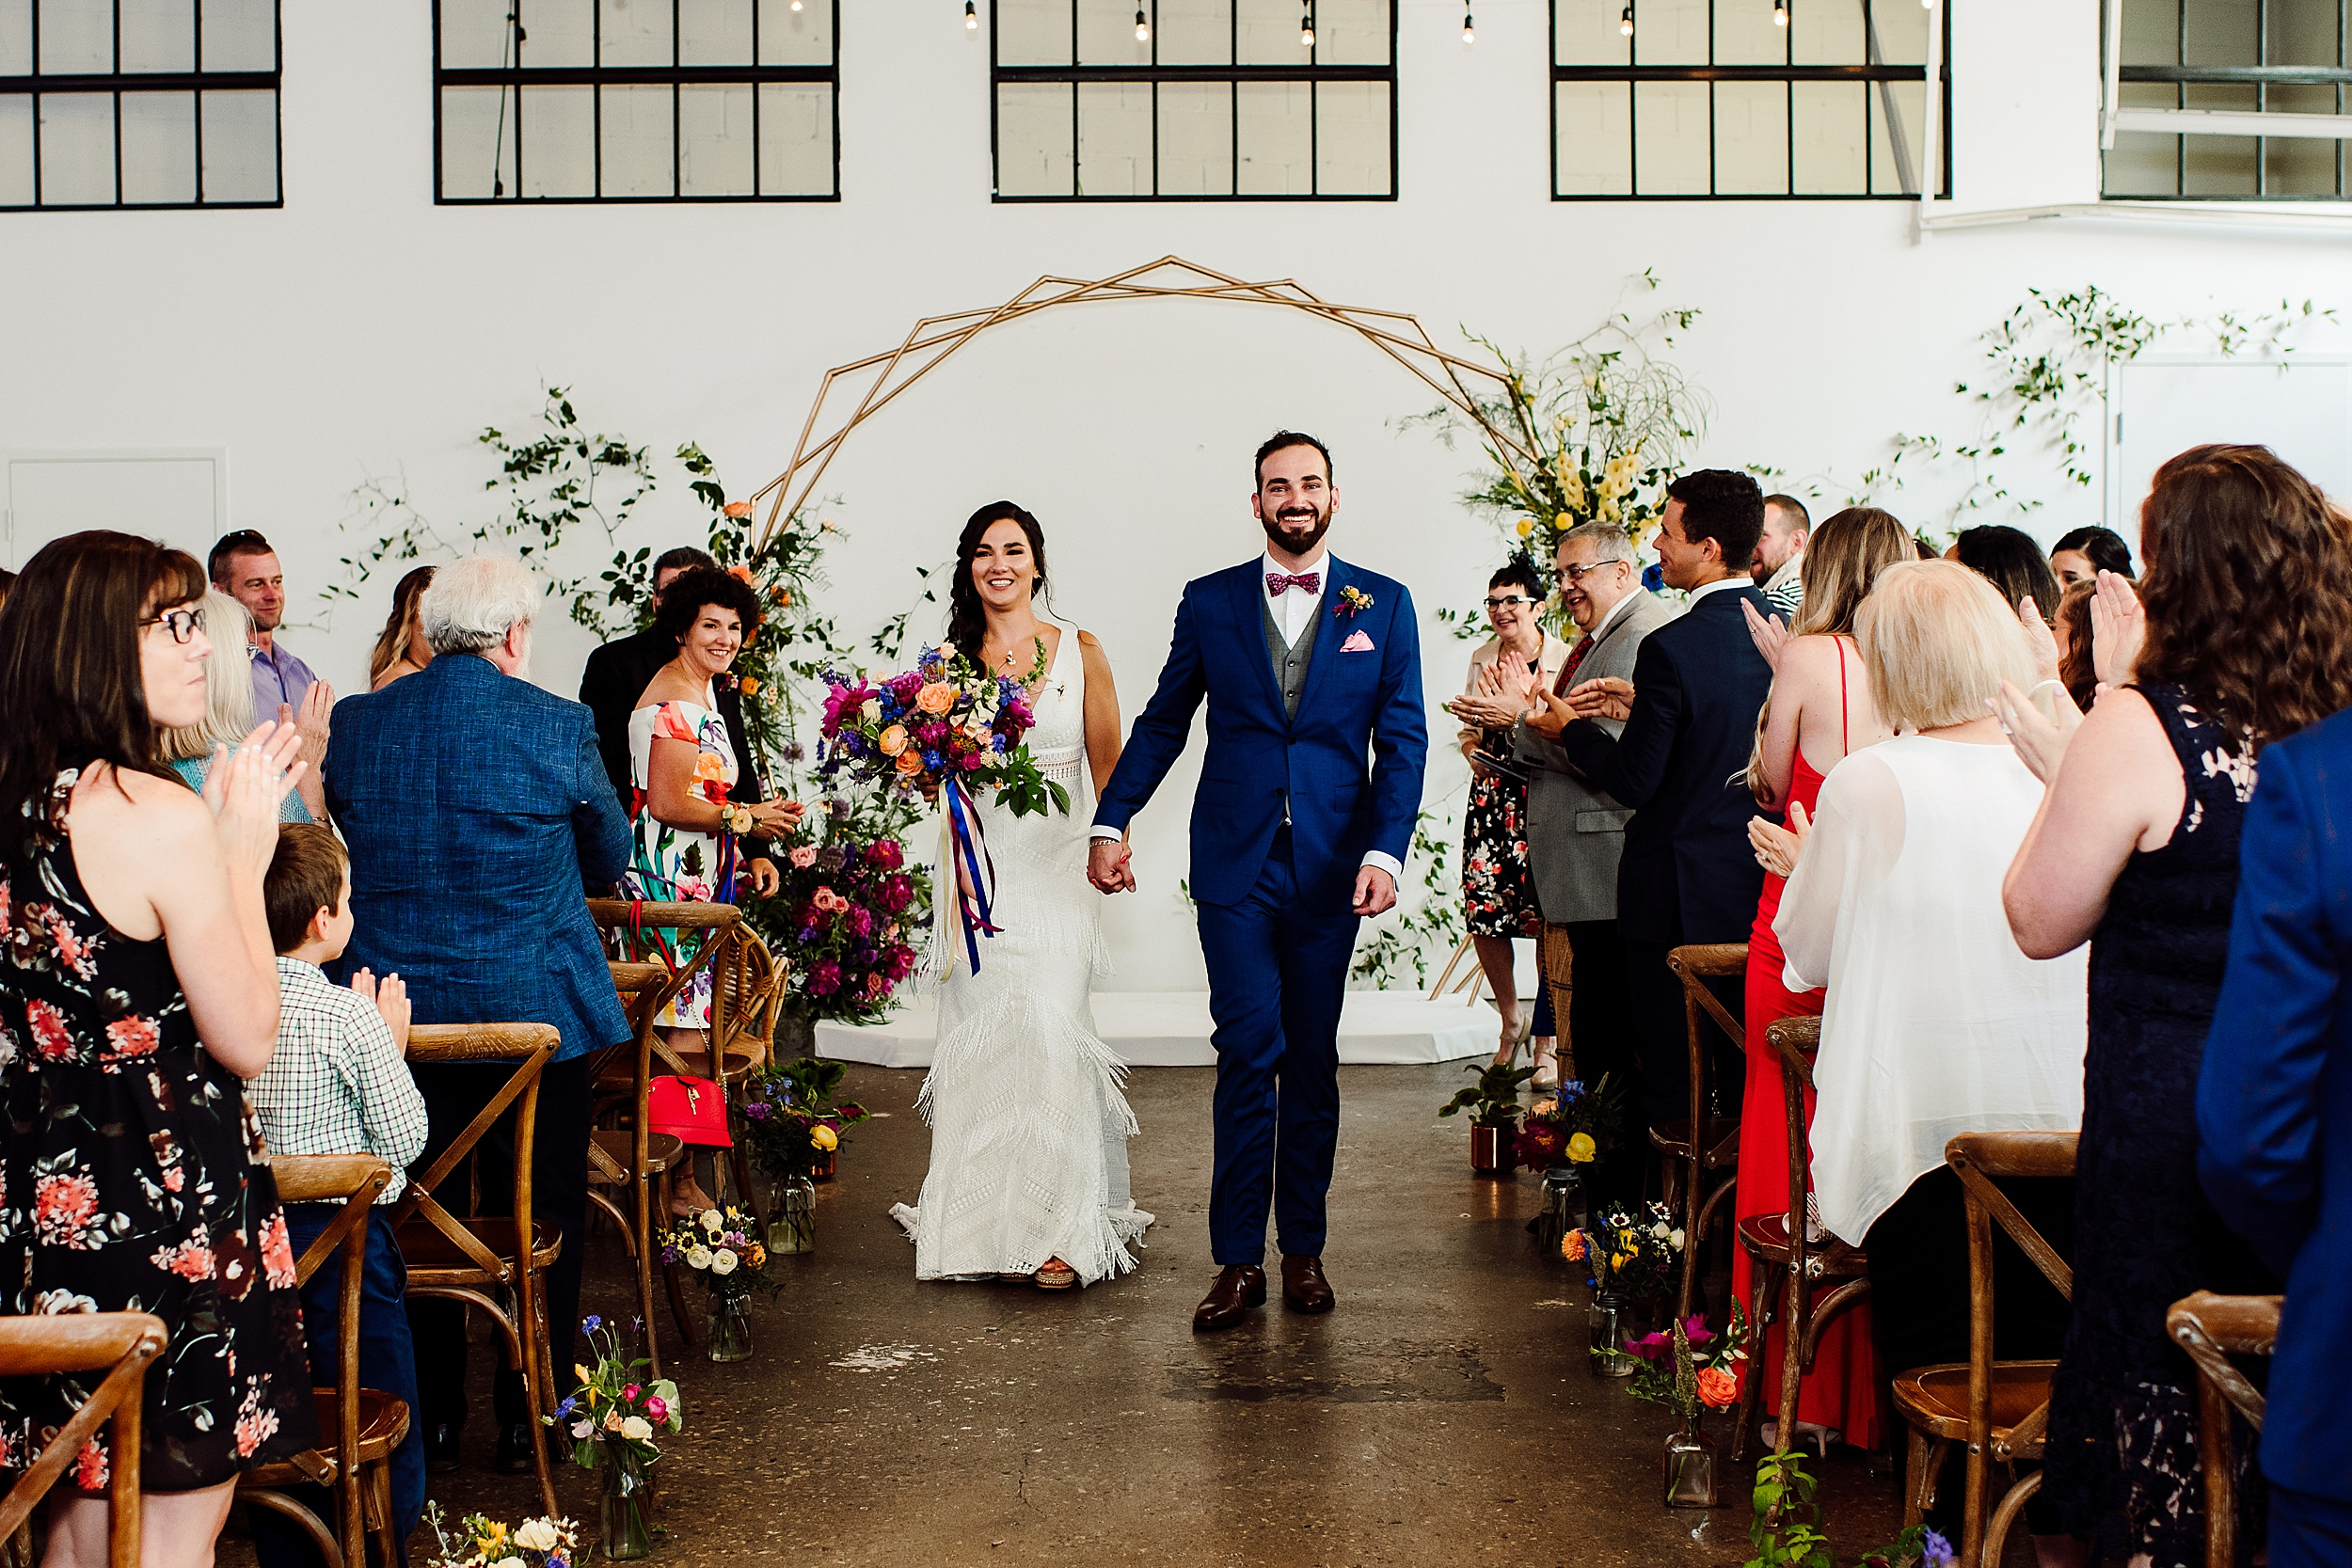 Airship-37-Berkeley-Events-Distillery-District-Wedding-Toronto-Wedding-Photographers_0070.jpg